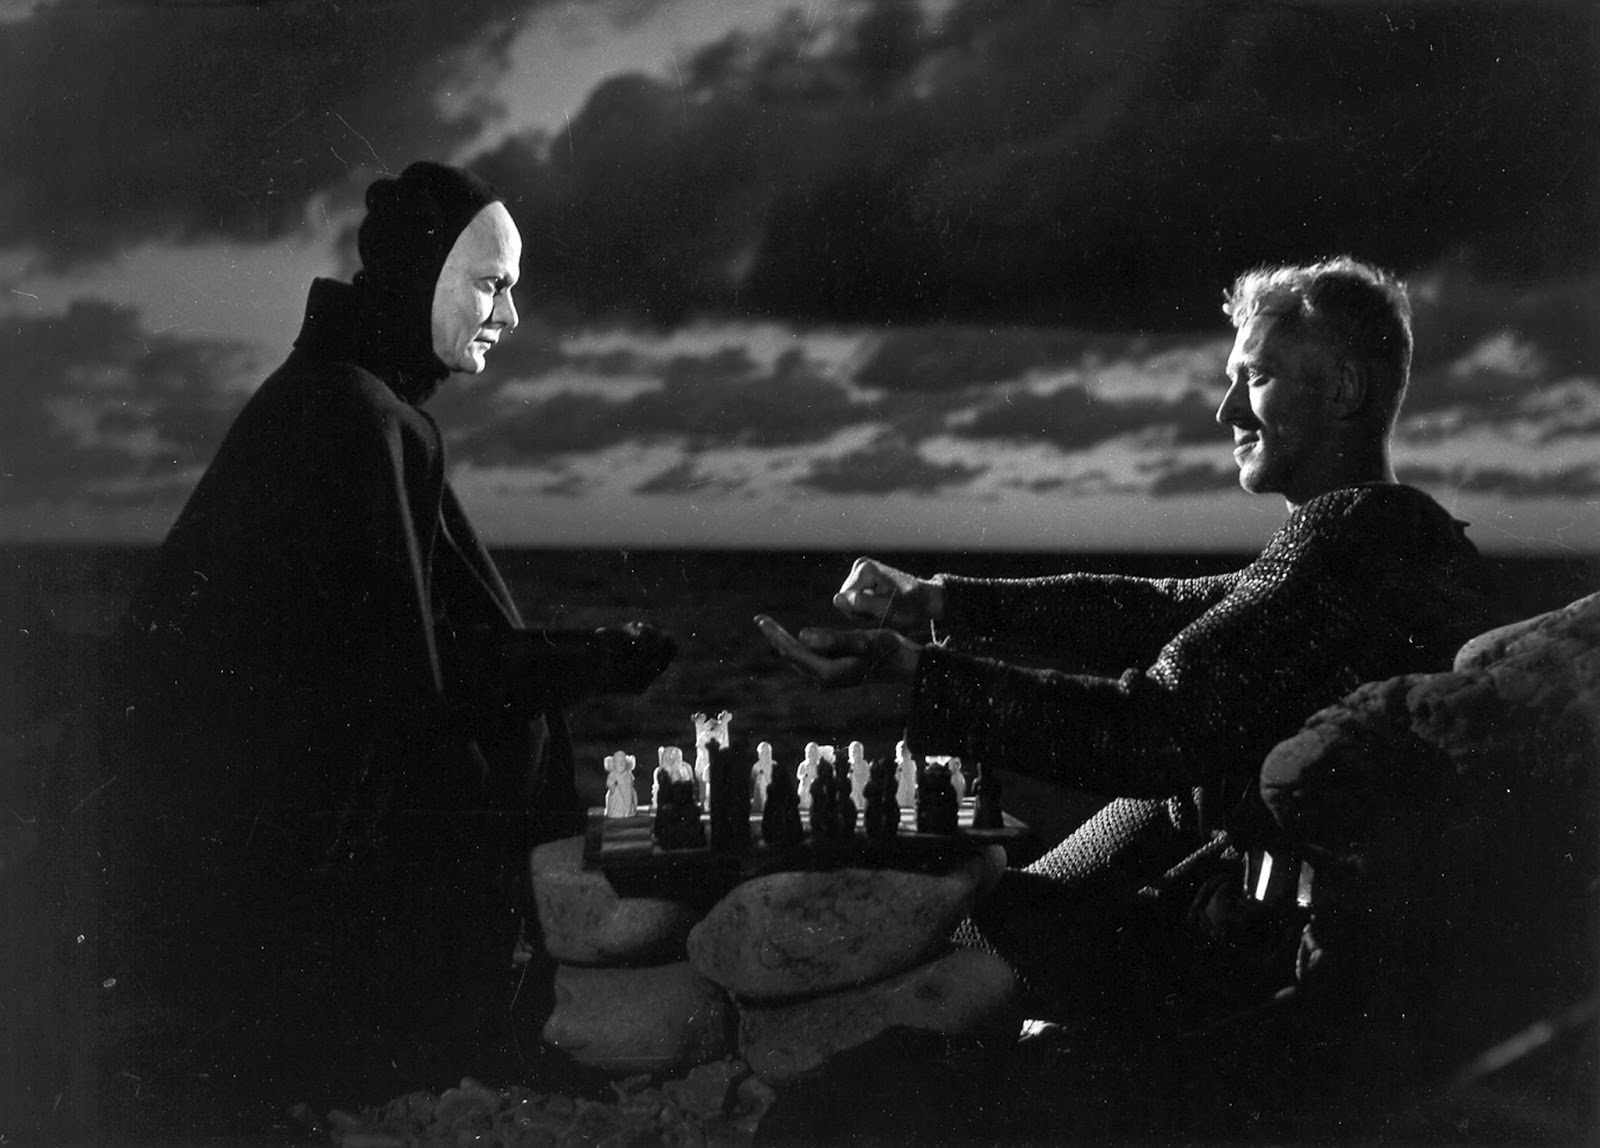 Diálogo de El séptimo sello de Ingmar Bergman